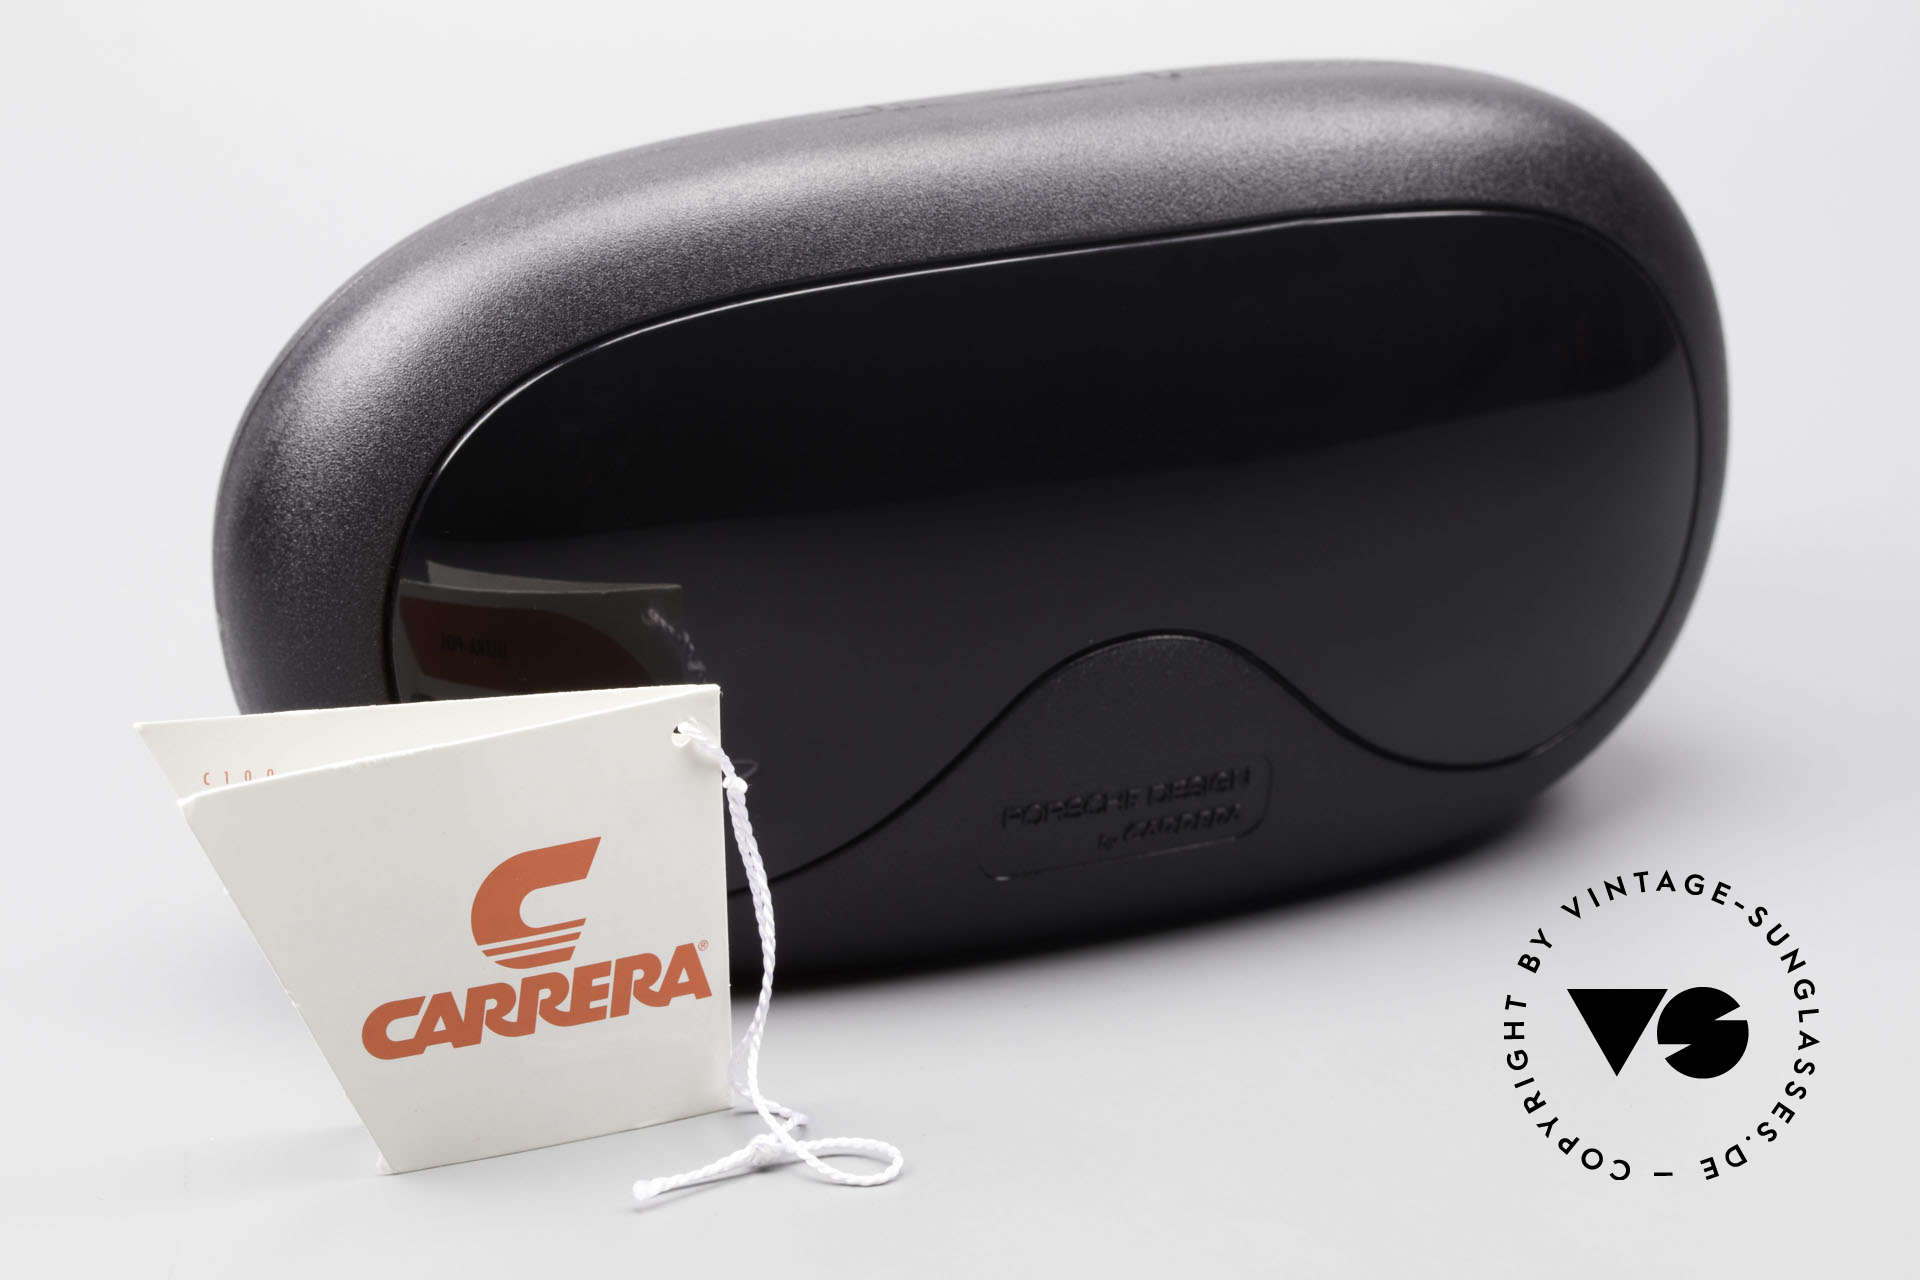 Carrera 5512 80's Miami Vice Sunglasses, Size: large, Made for Men